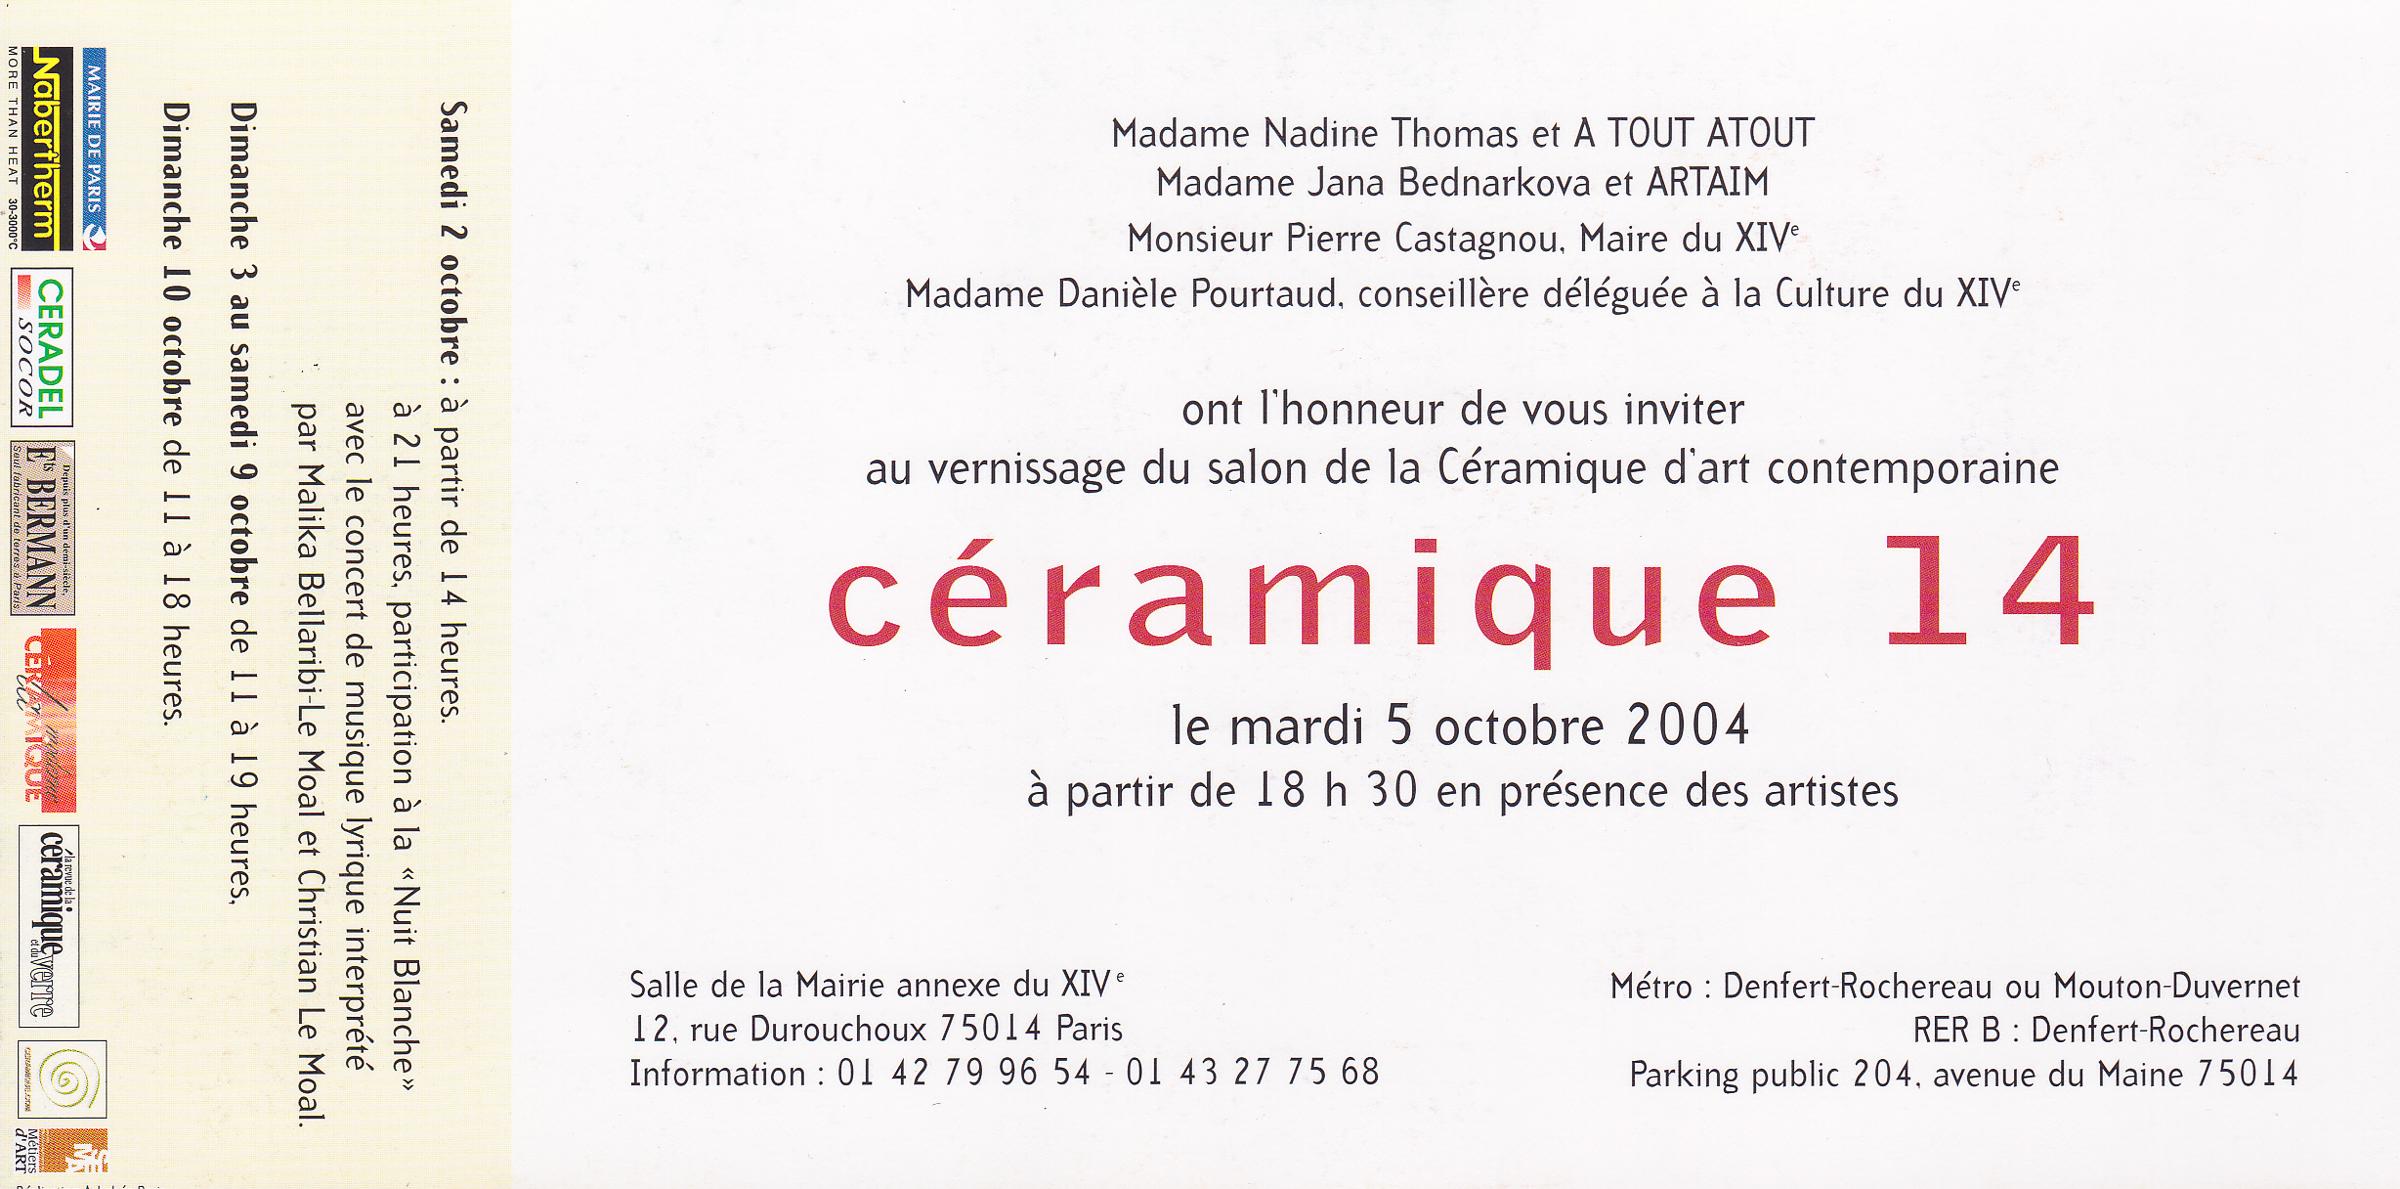 gallery 2004 cer 14 copy-2.jpg